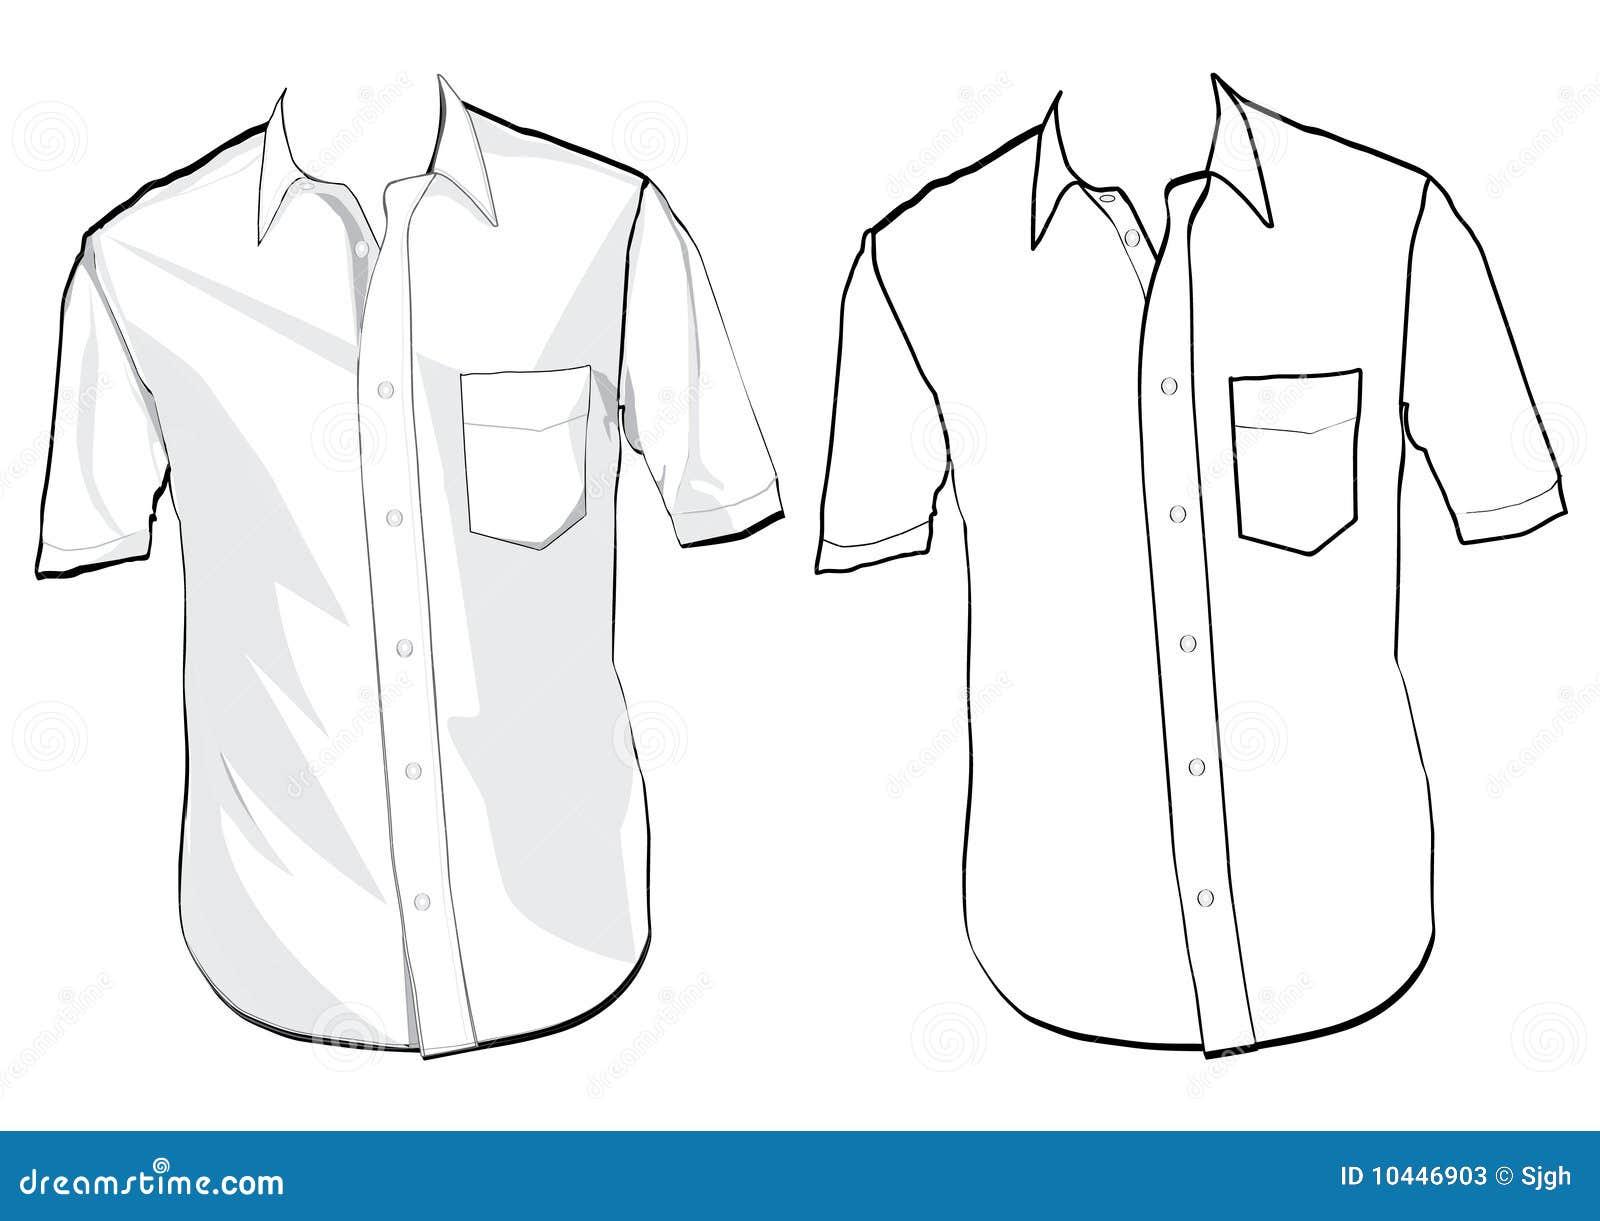 shirt template stock photos image 10446903. Black Bedroom Furniture Sets. Home Design Ideas